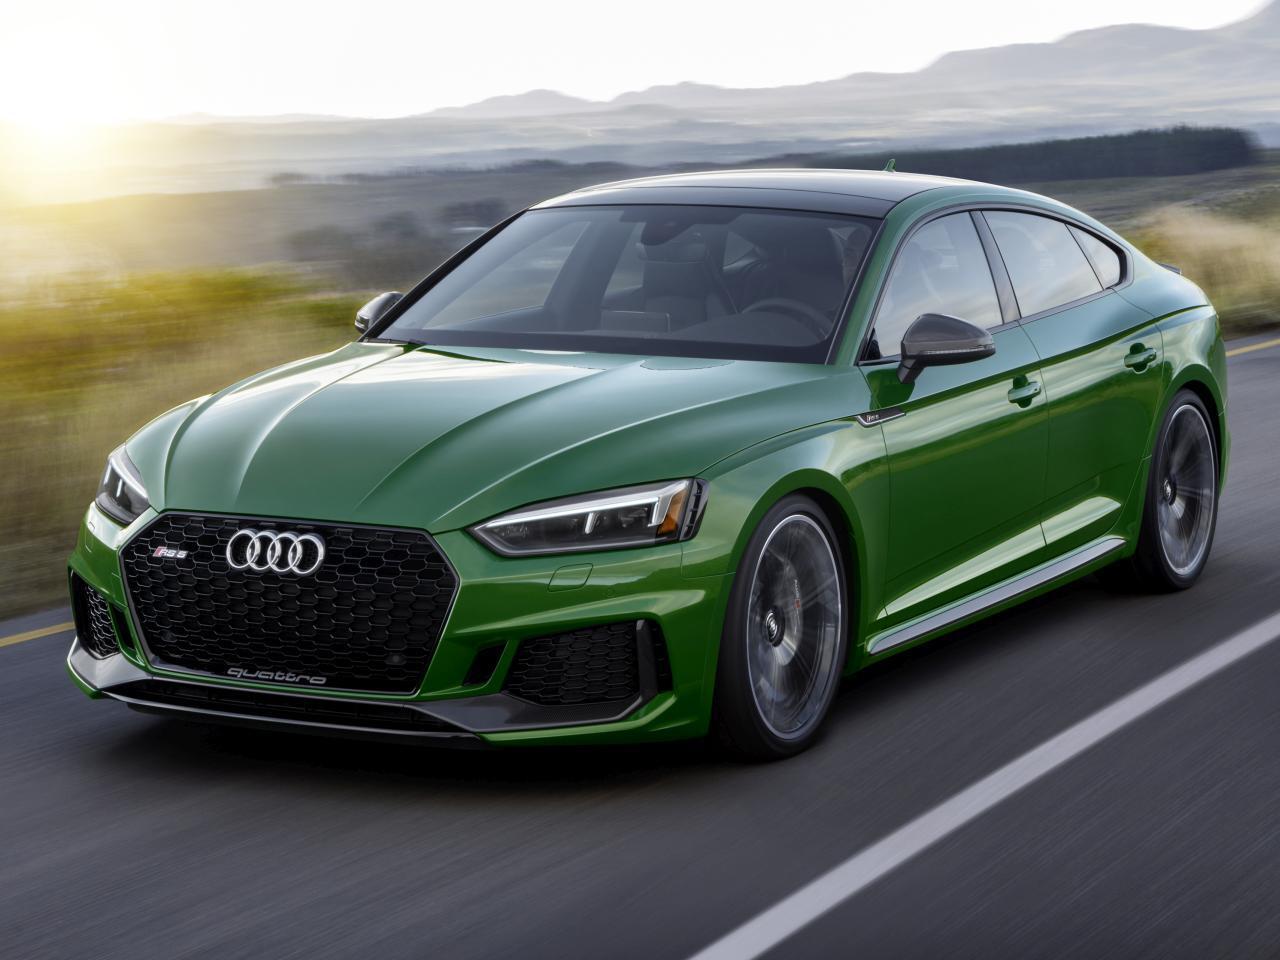 Bild zu Audi RS 5 Sportback (2018)